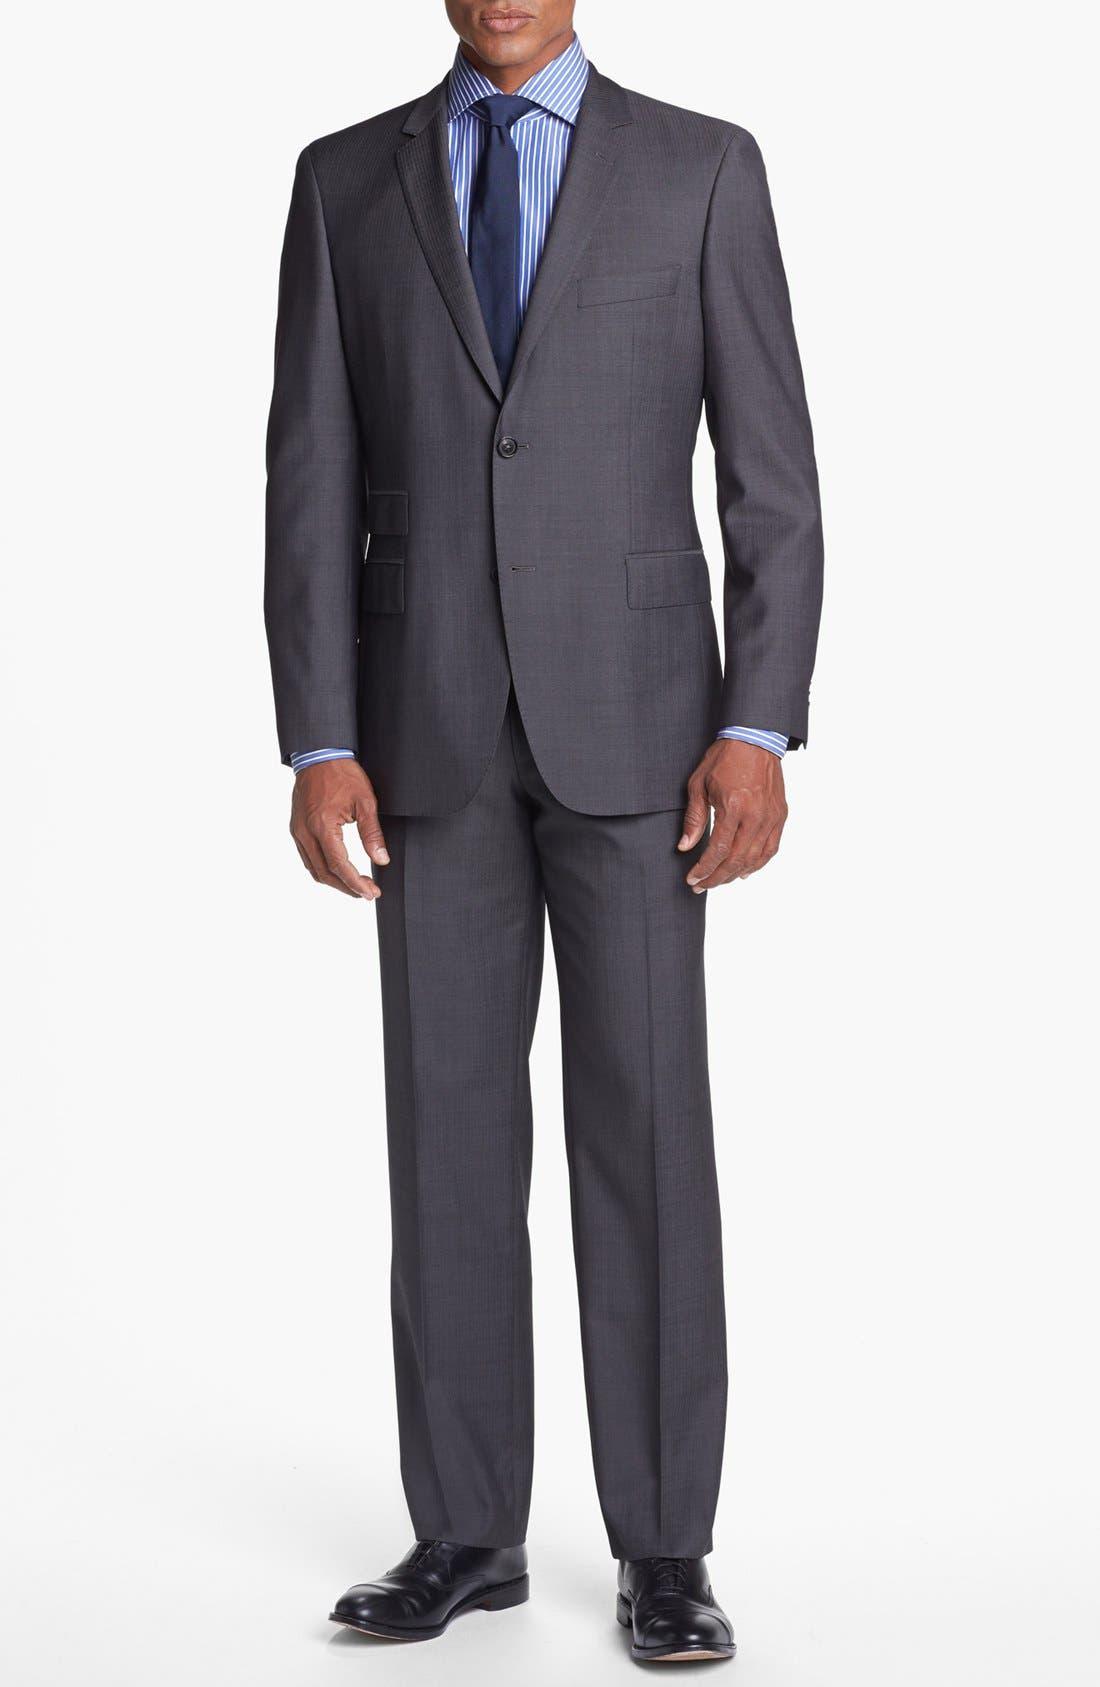 Alternate Image 1 Selected - BOSS HUGO BOSS 'Edison/Power' Classic Fit Wool Suit